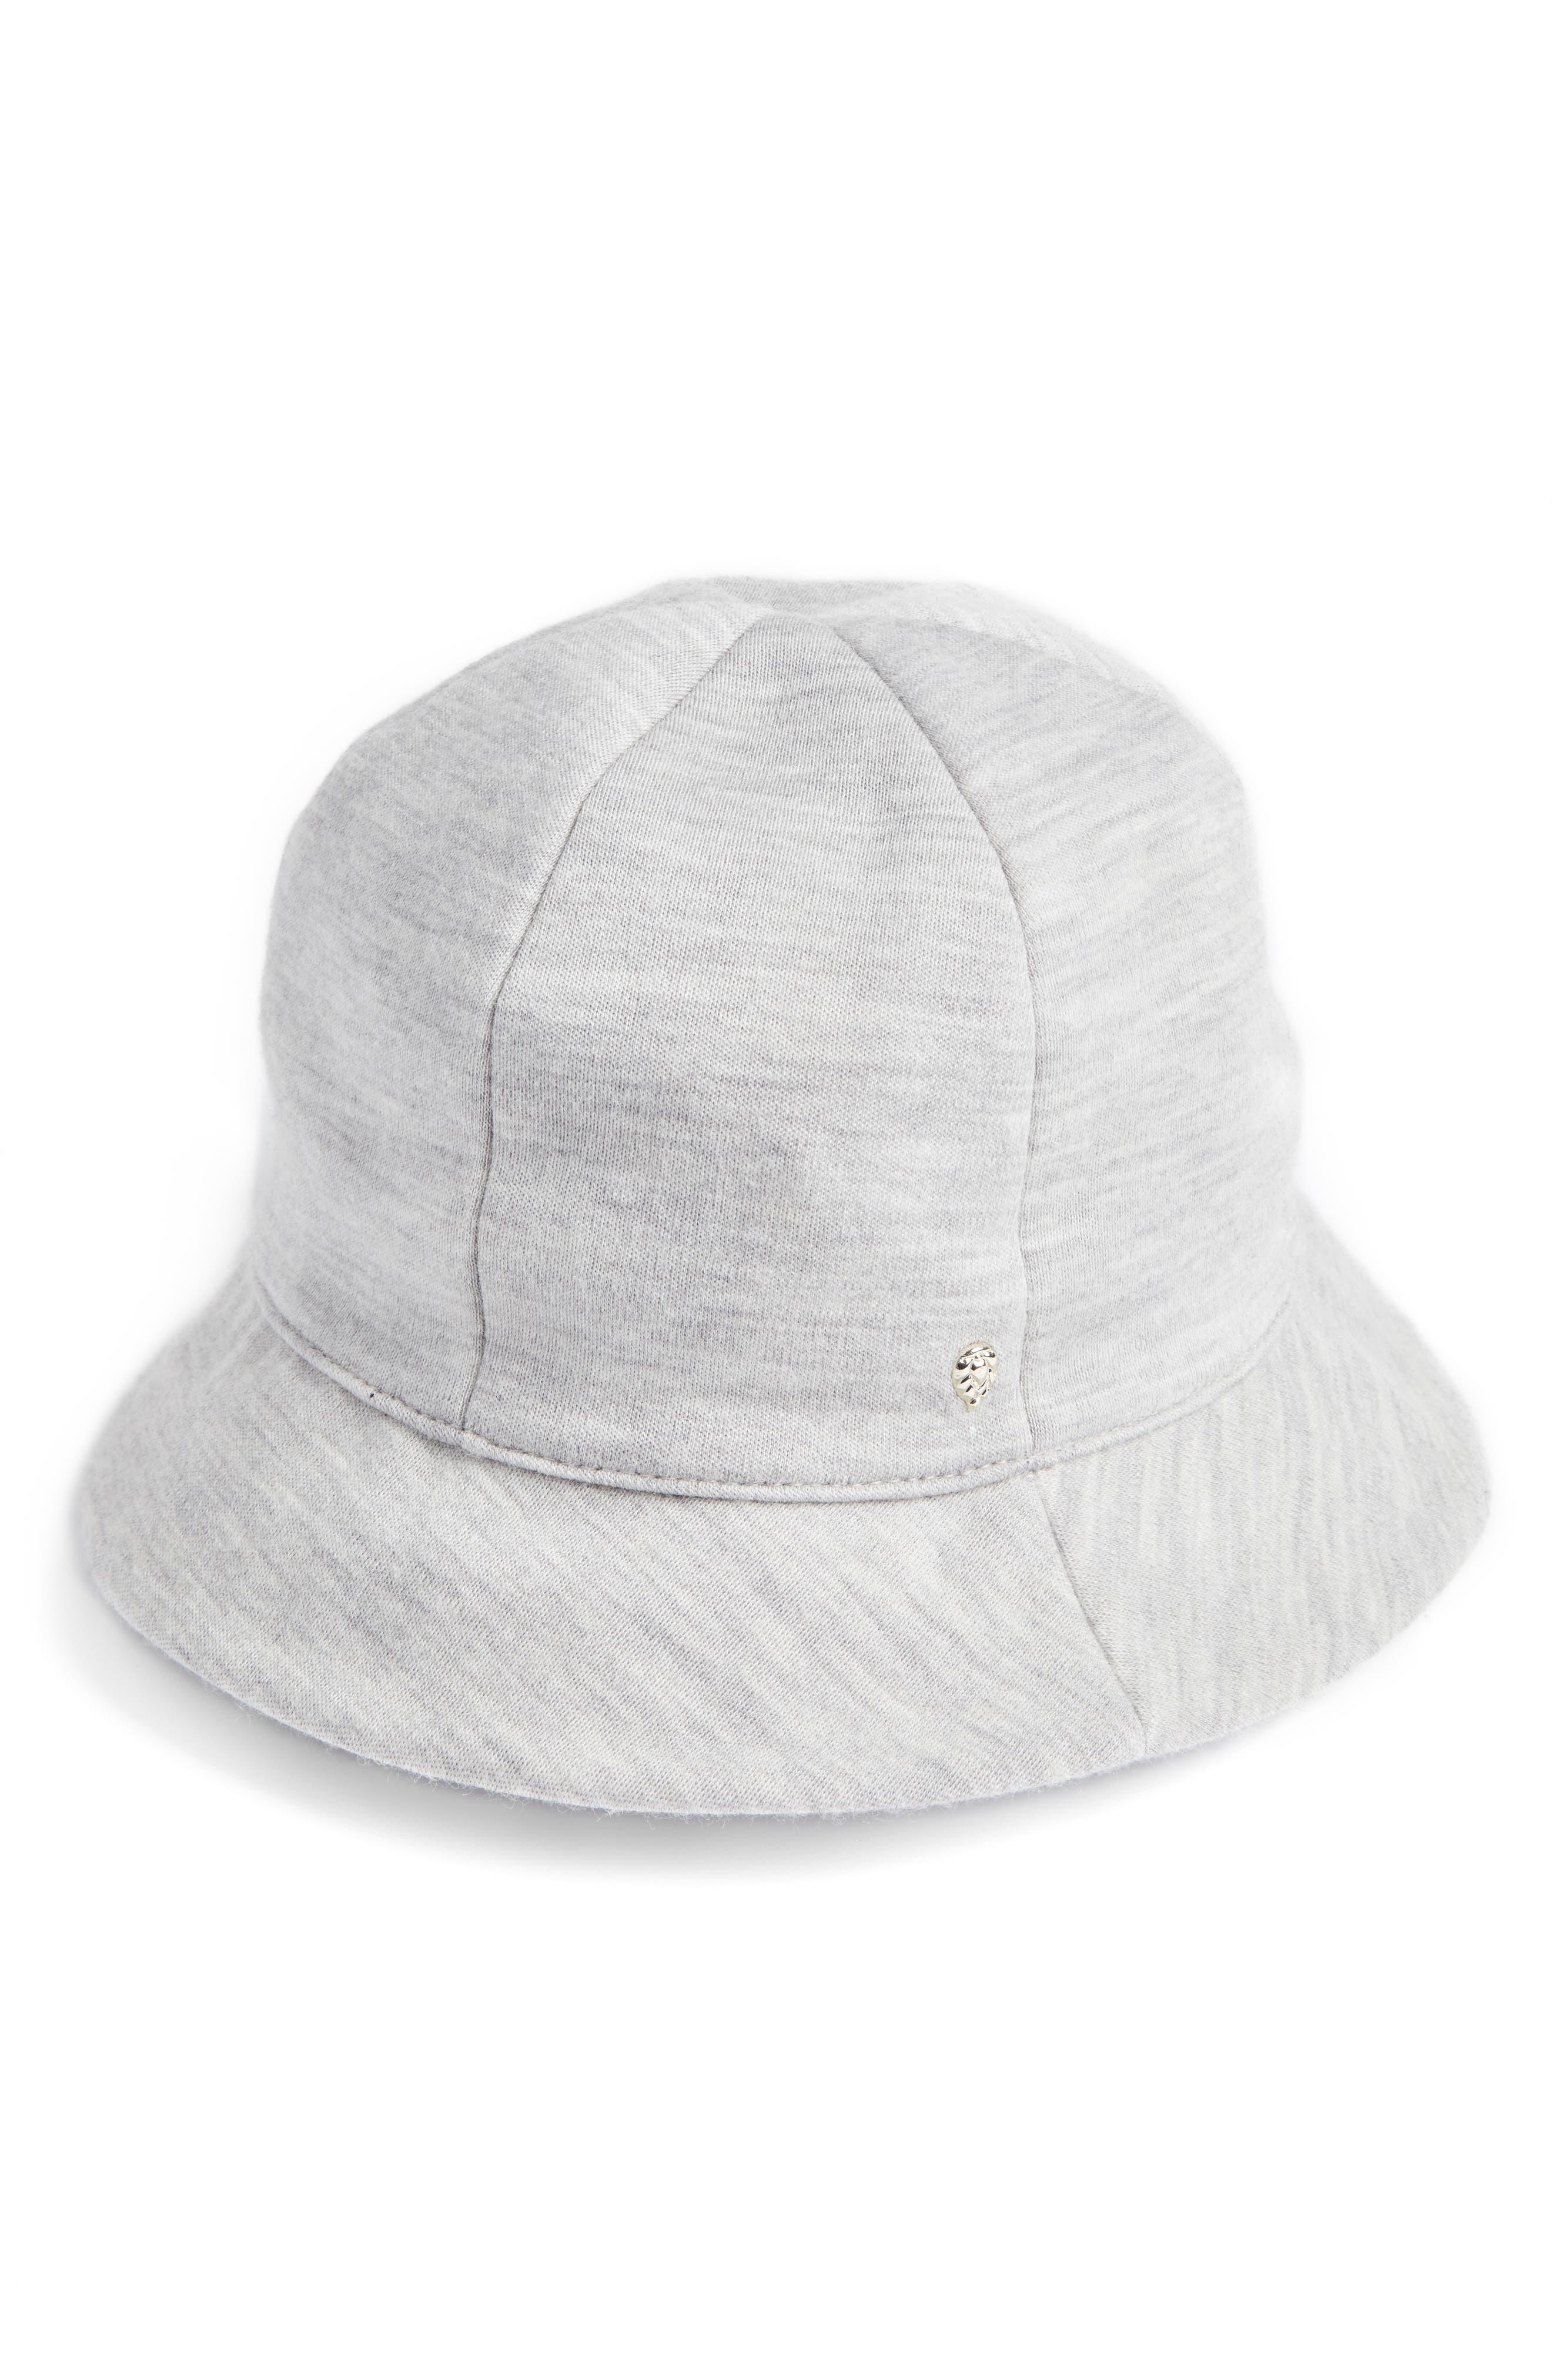 Merino Wool Jersey Bucket Hat,                             Main thumbnail 1, color,                             033